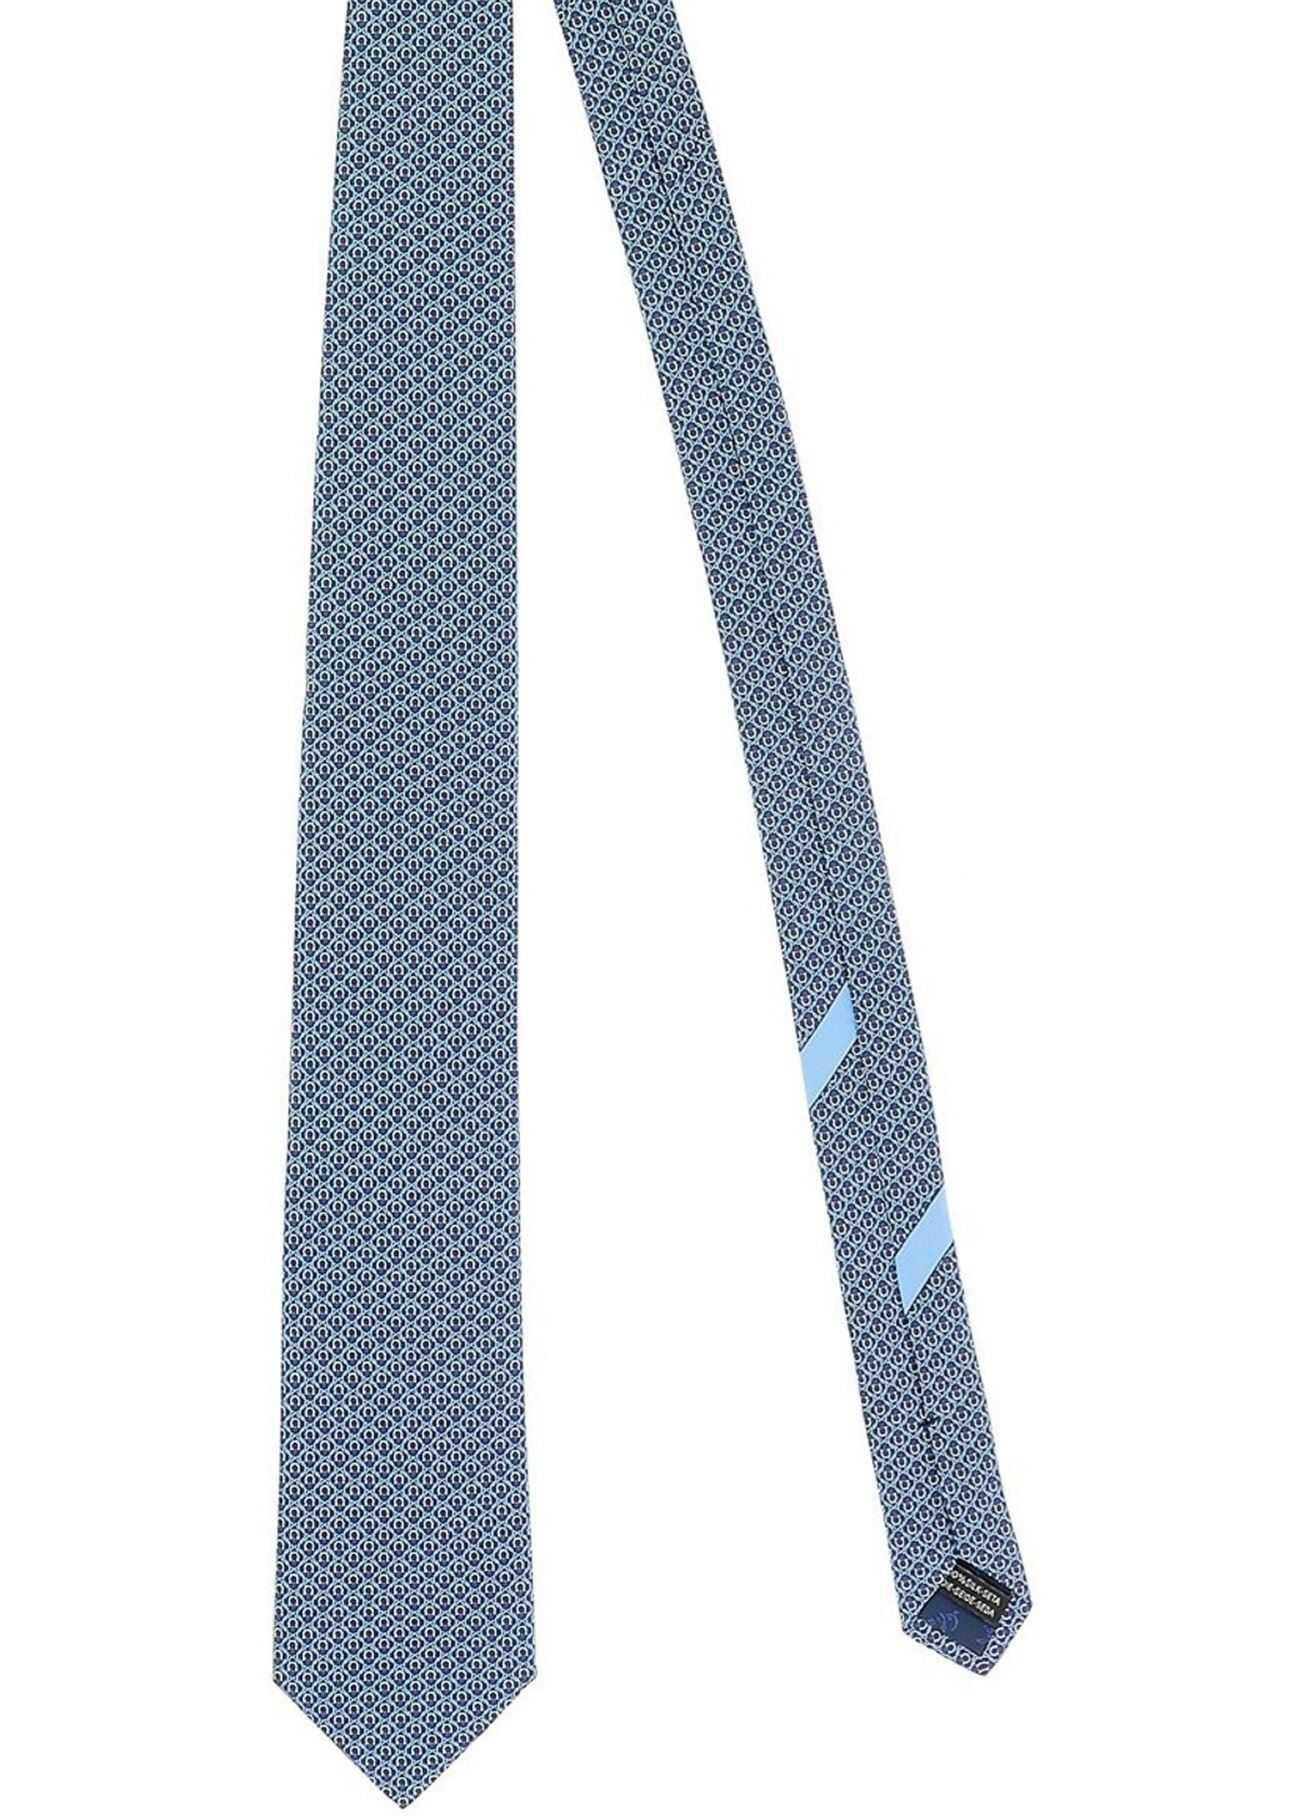 Salvatore Ferragamo Gancini Printed Tie In Blue Blue